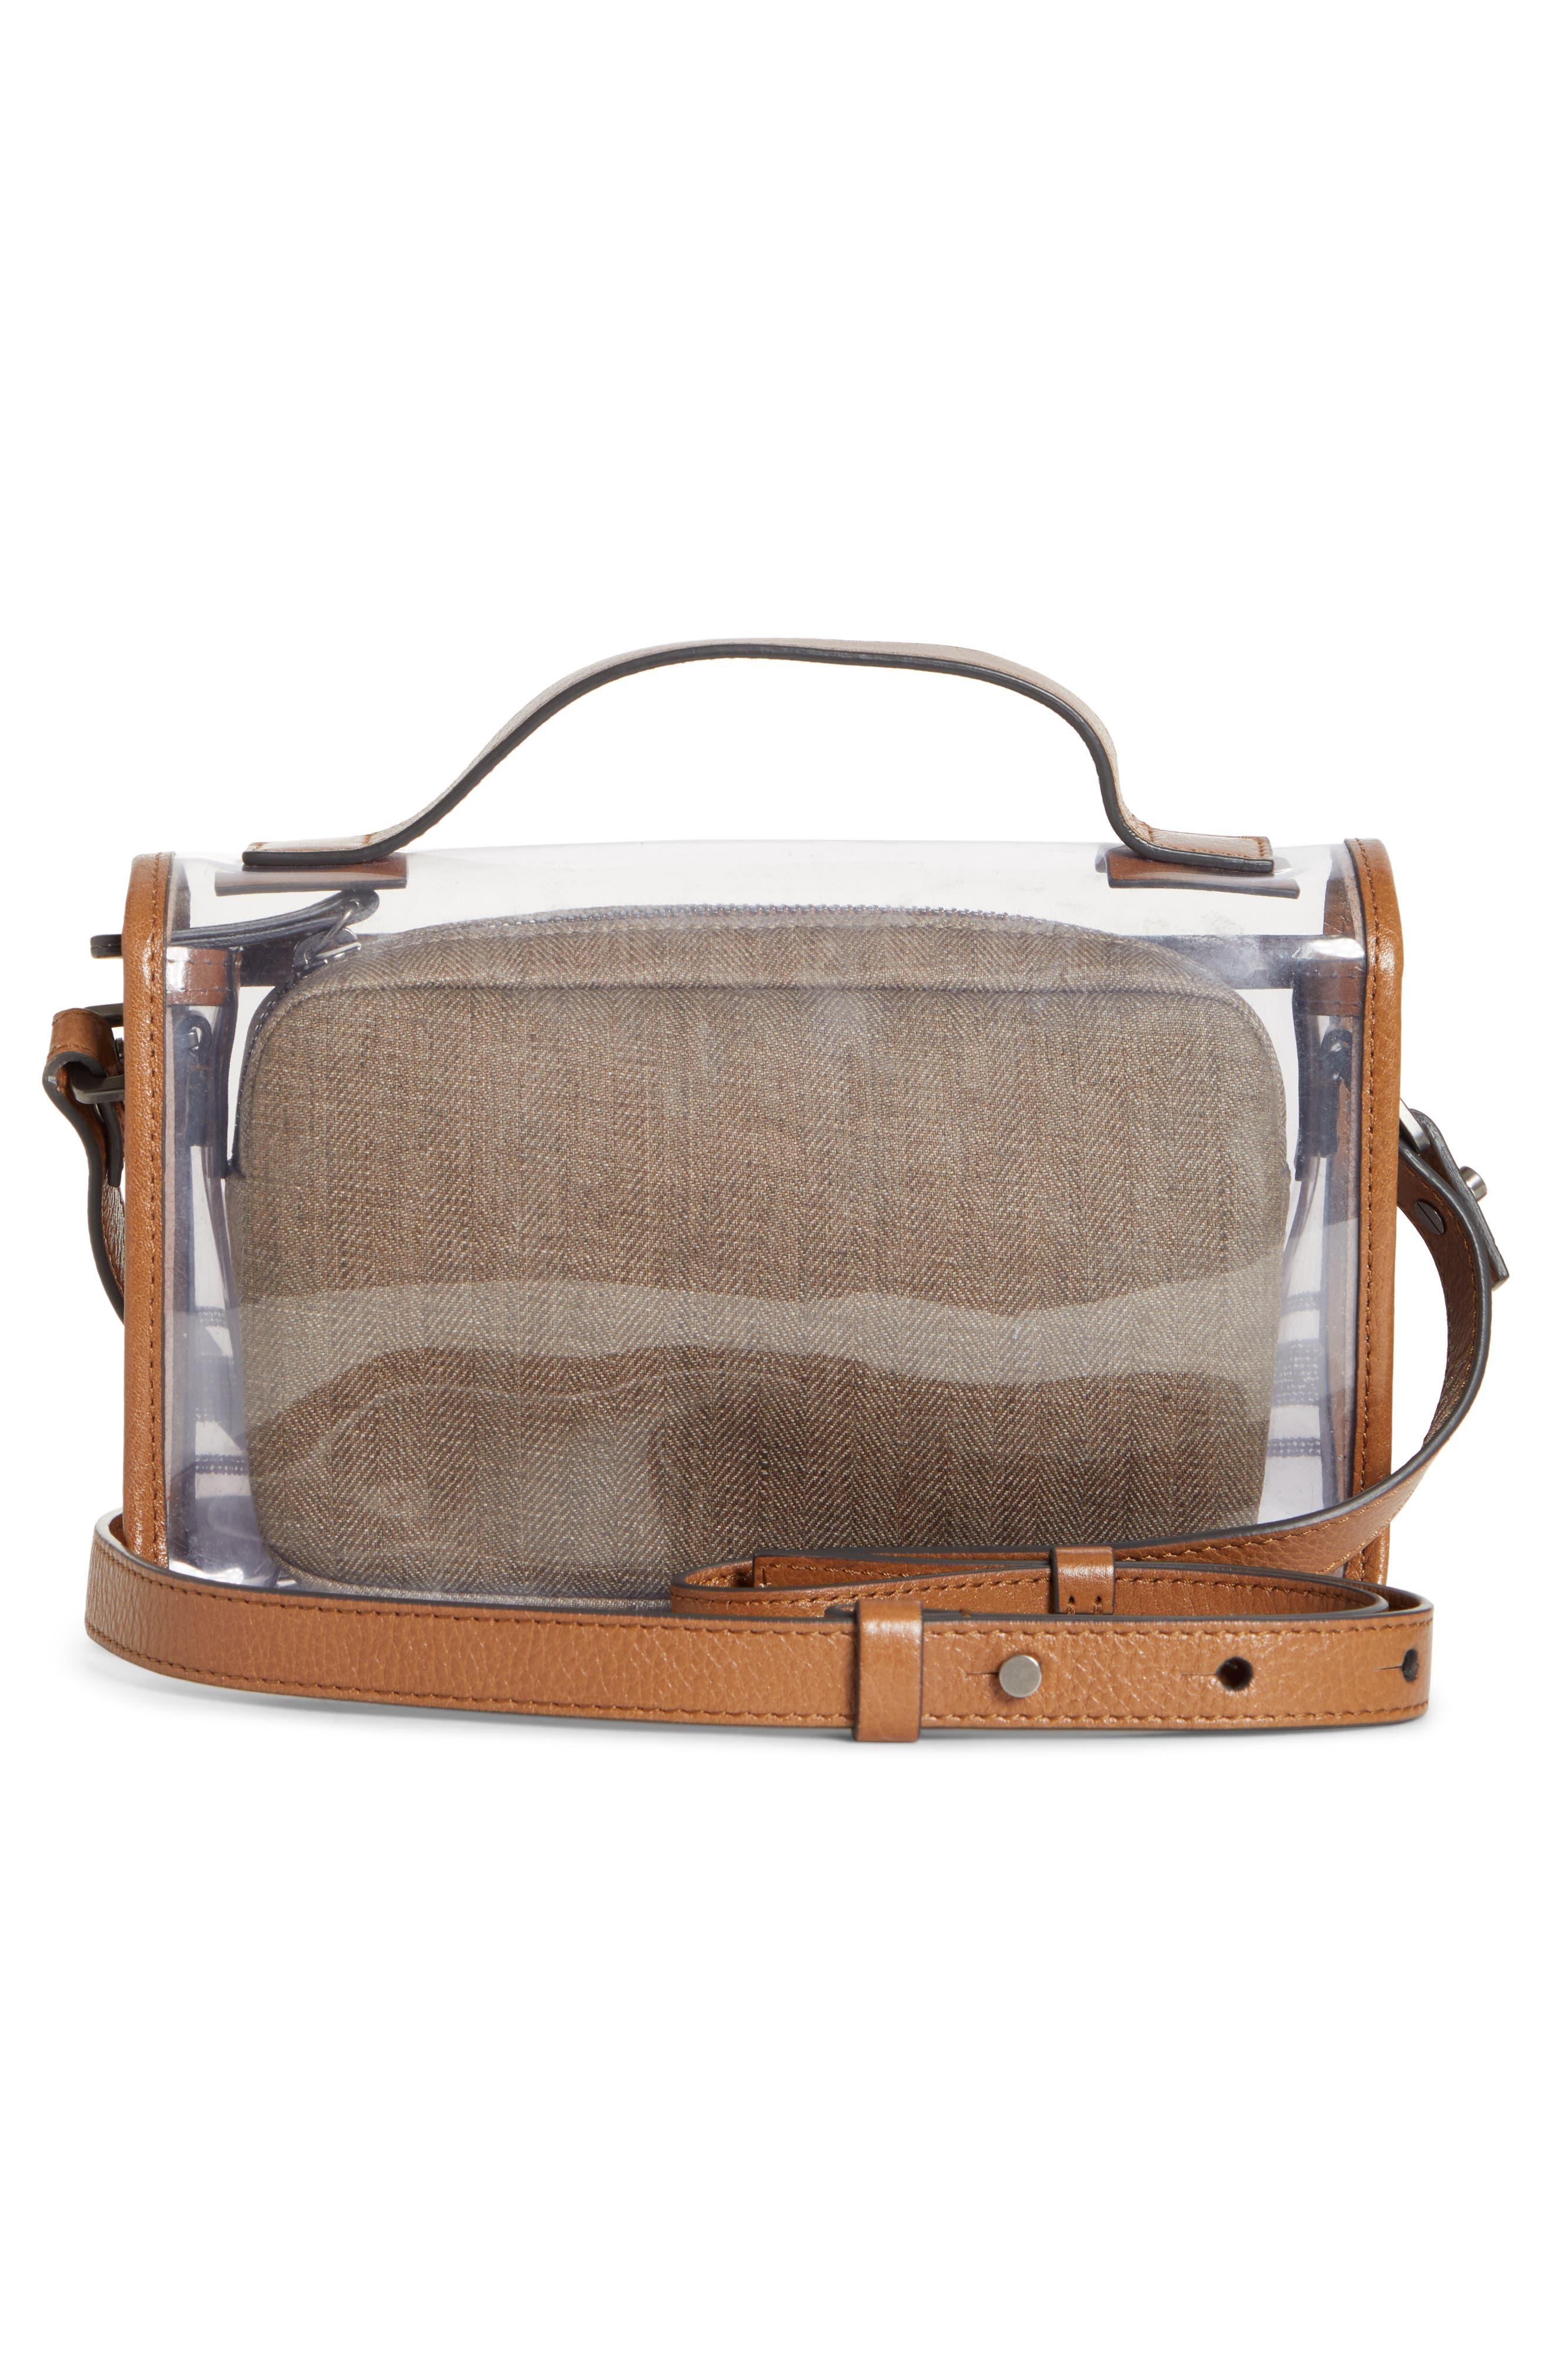 BRUNELLO CUCINELLI, Monili & Leather Trim Clear Shoulder Bag, Alternate thumbnail 3, color, LT BROWN